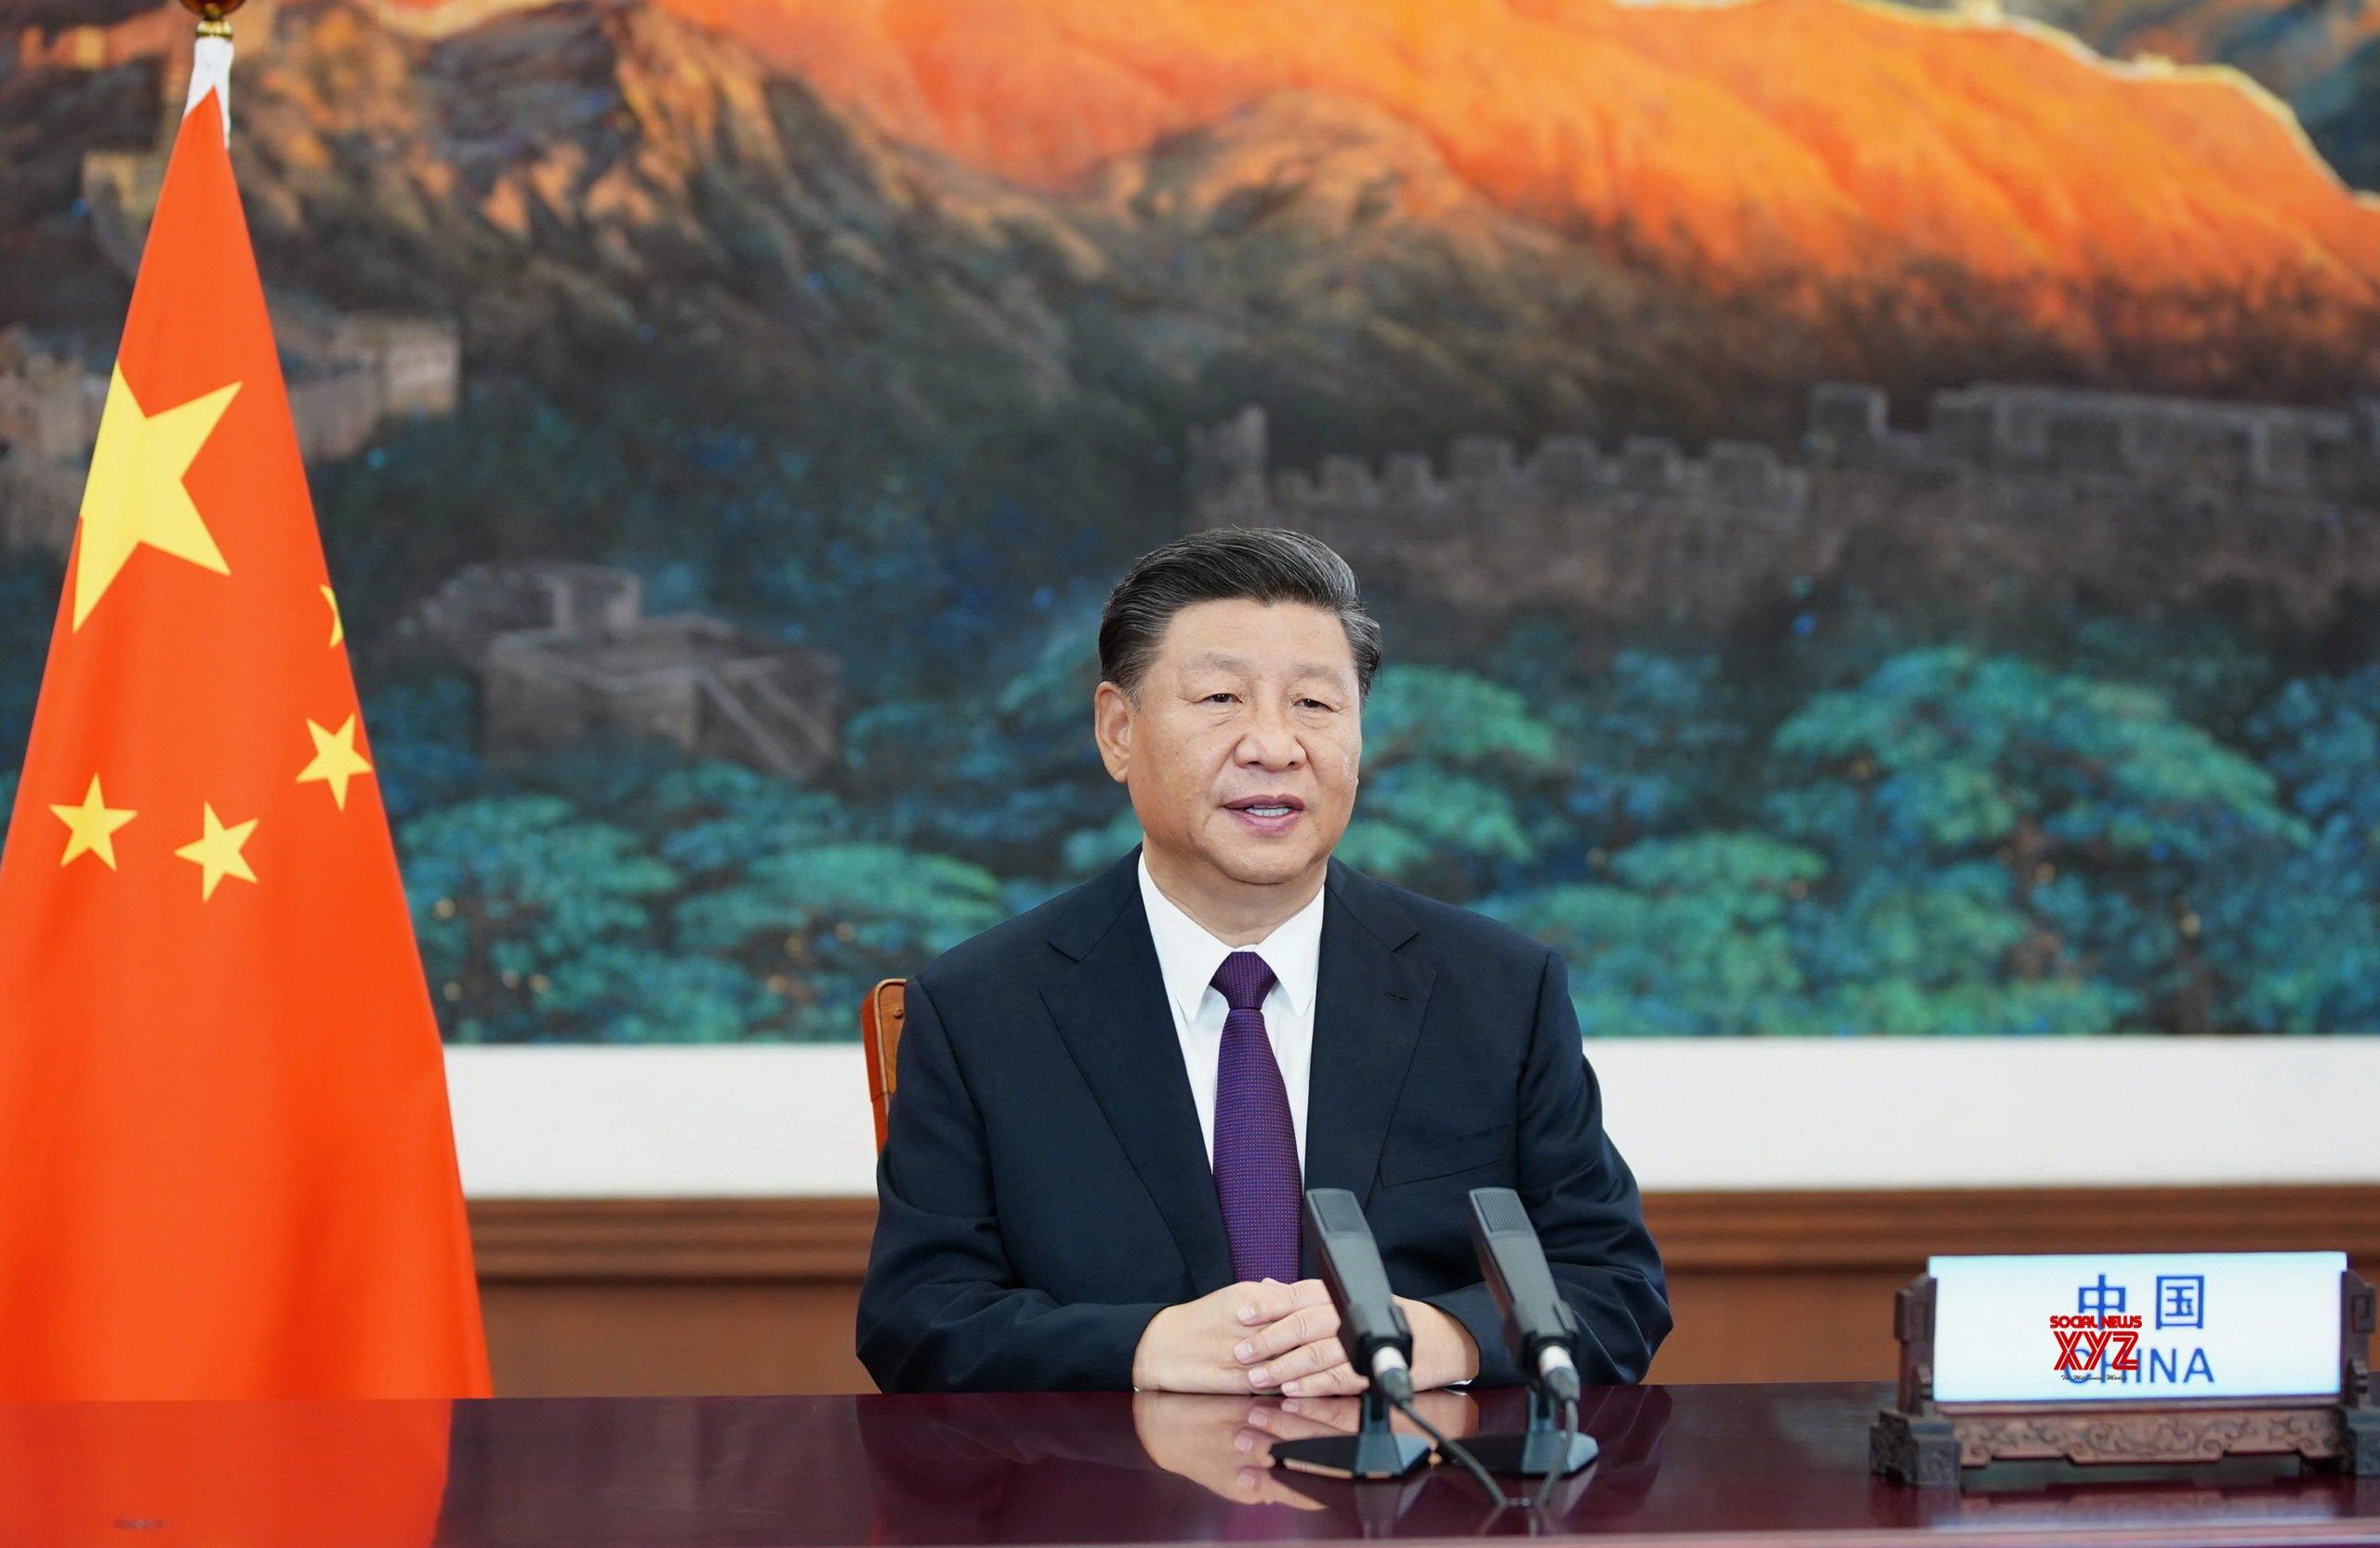 CHINA - BEIJING - XI JINPING - UN - 75TH ANNIVERSARY #Gallery